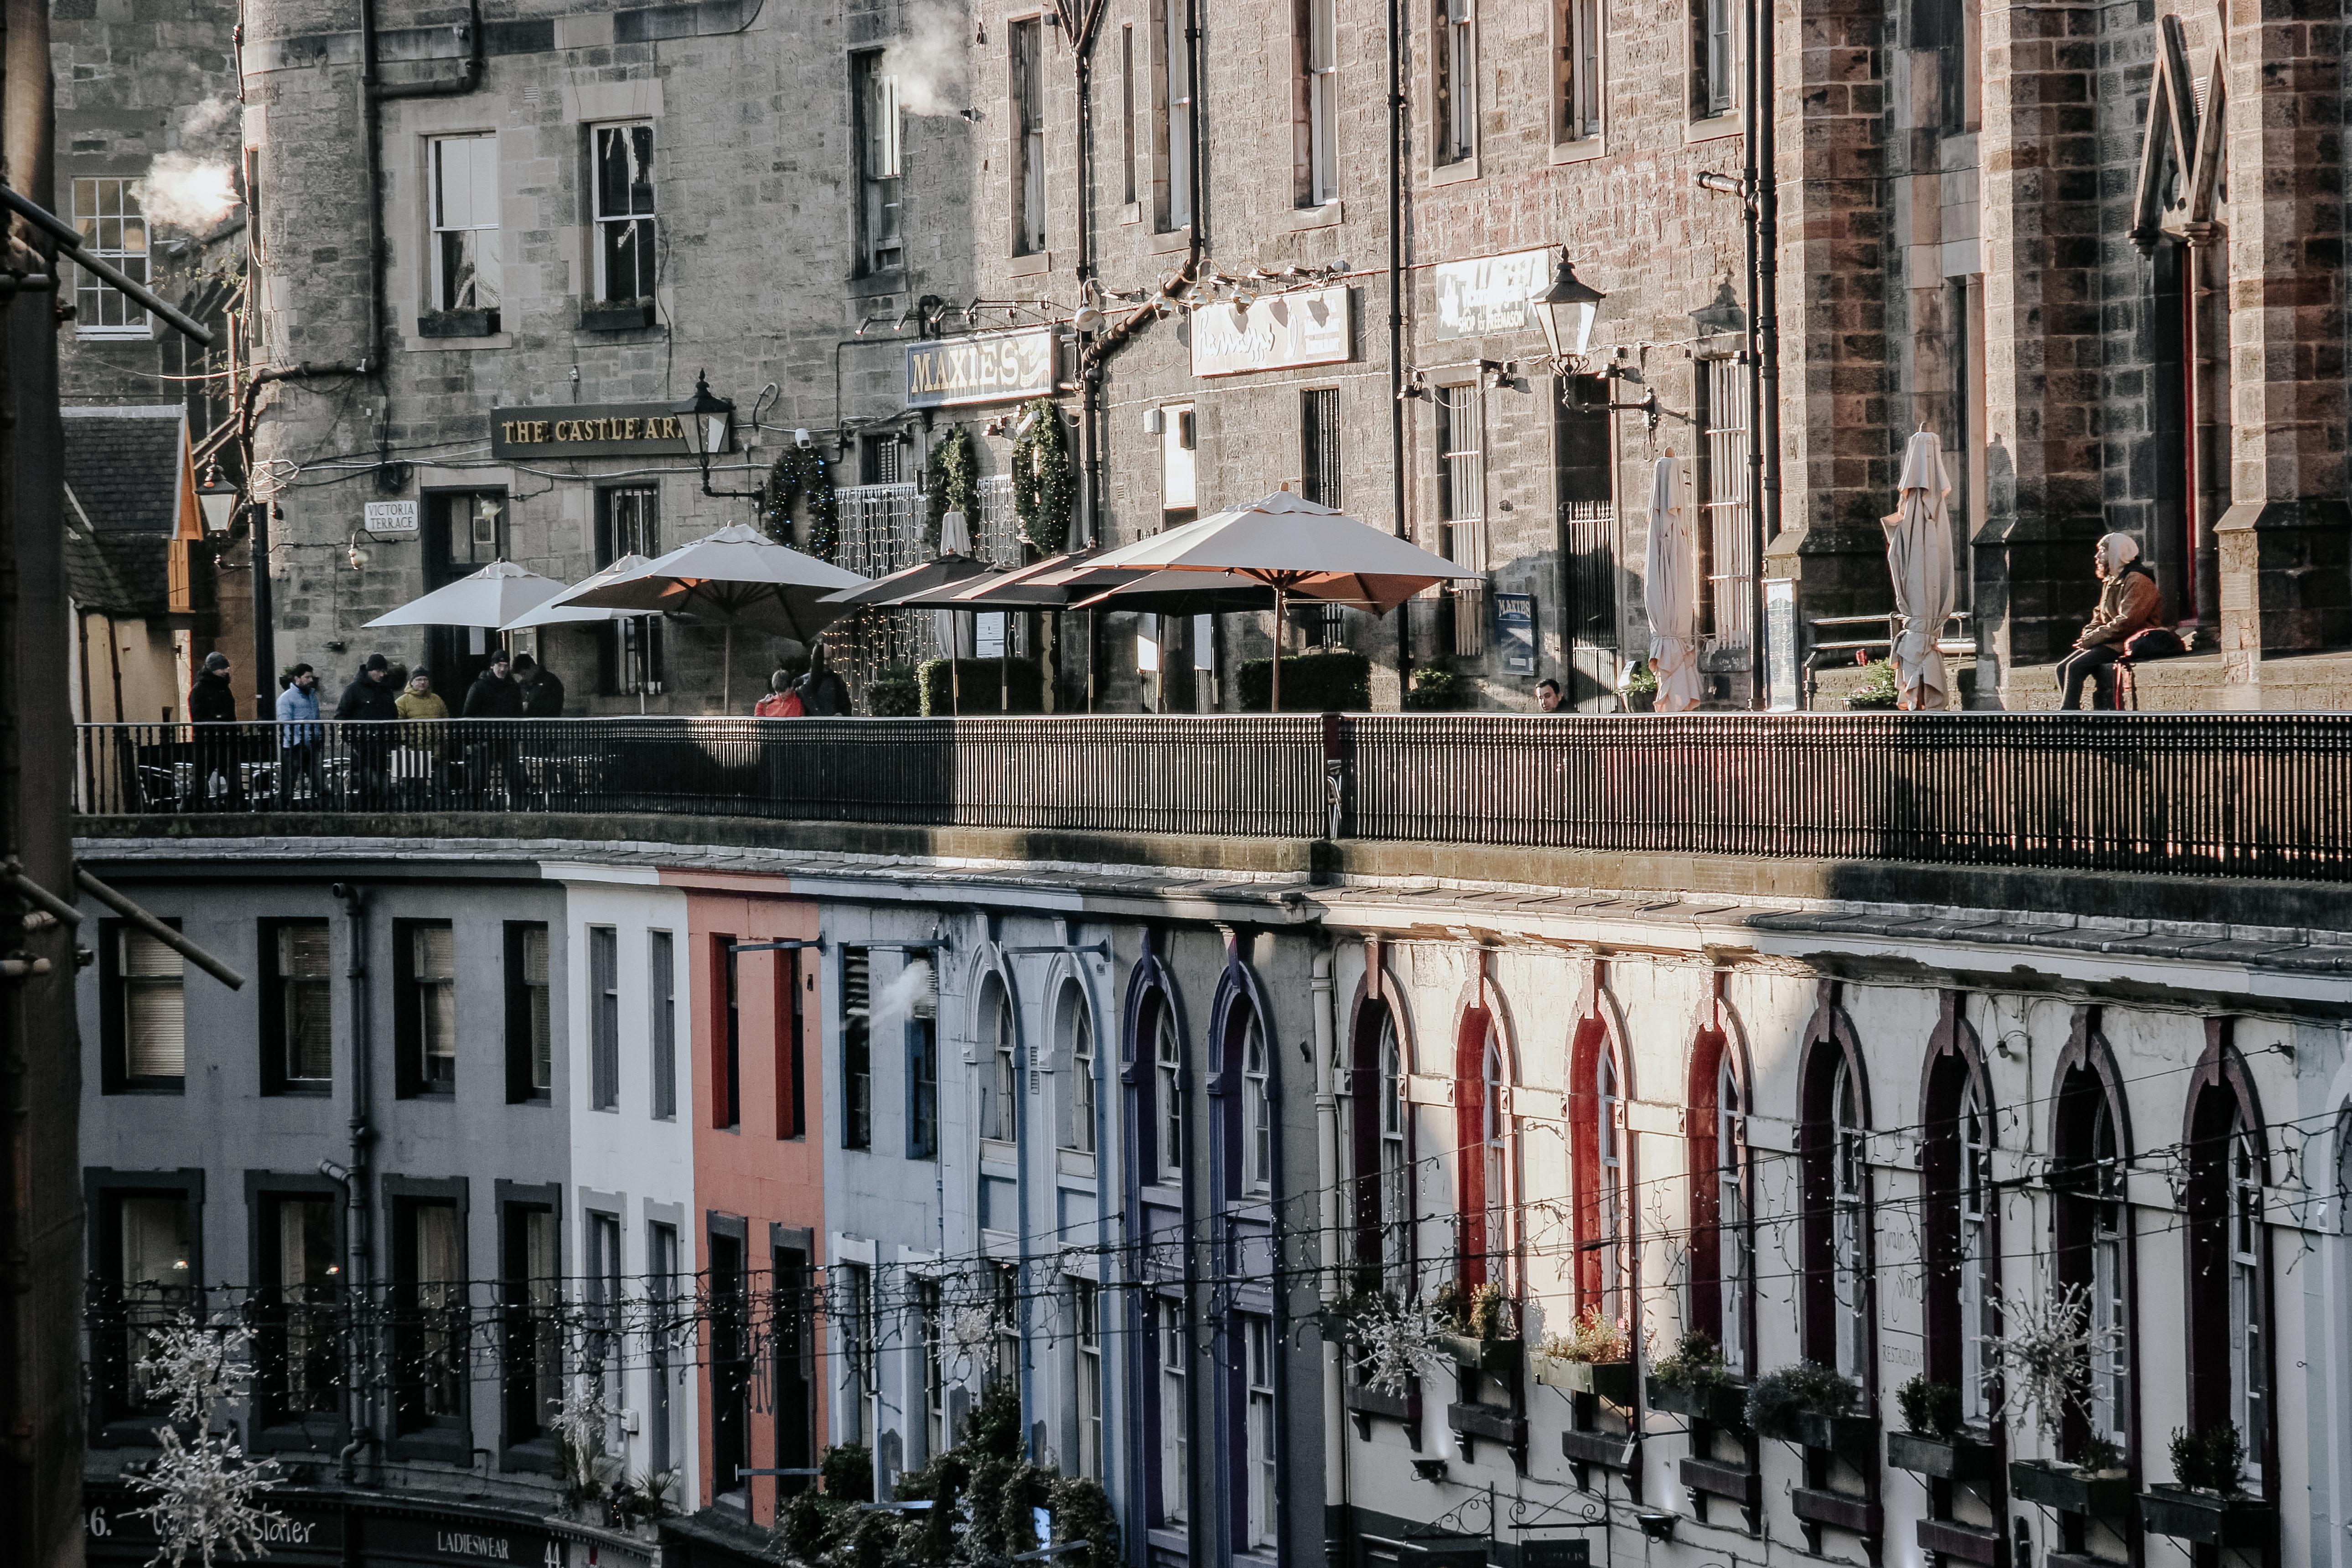 Balcony street in Edinburgh